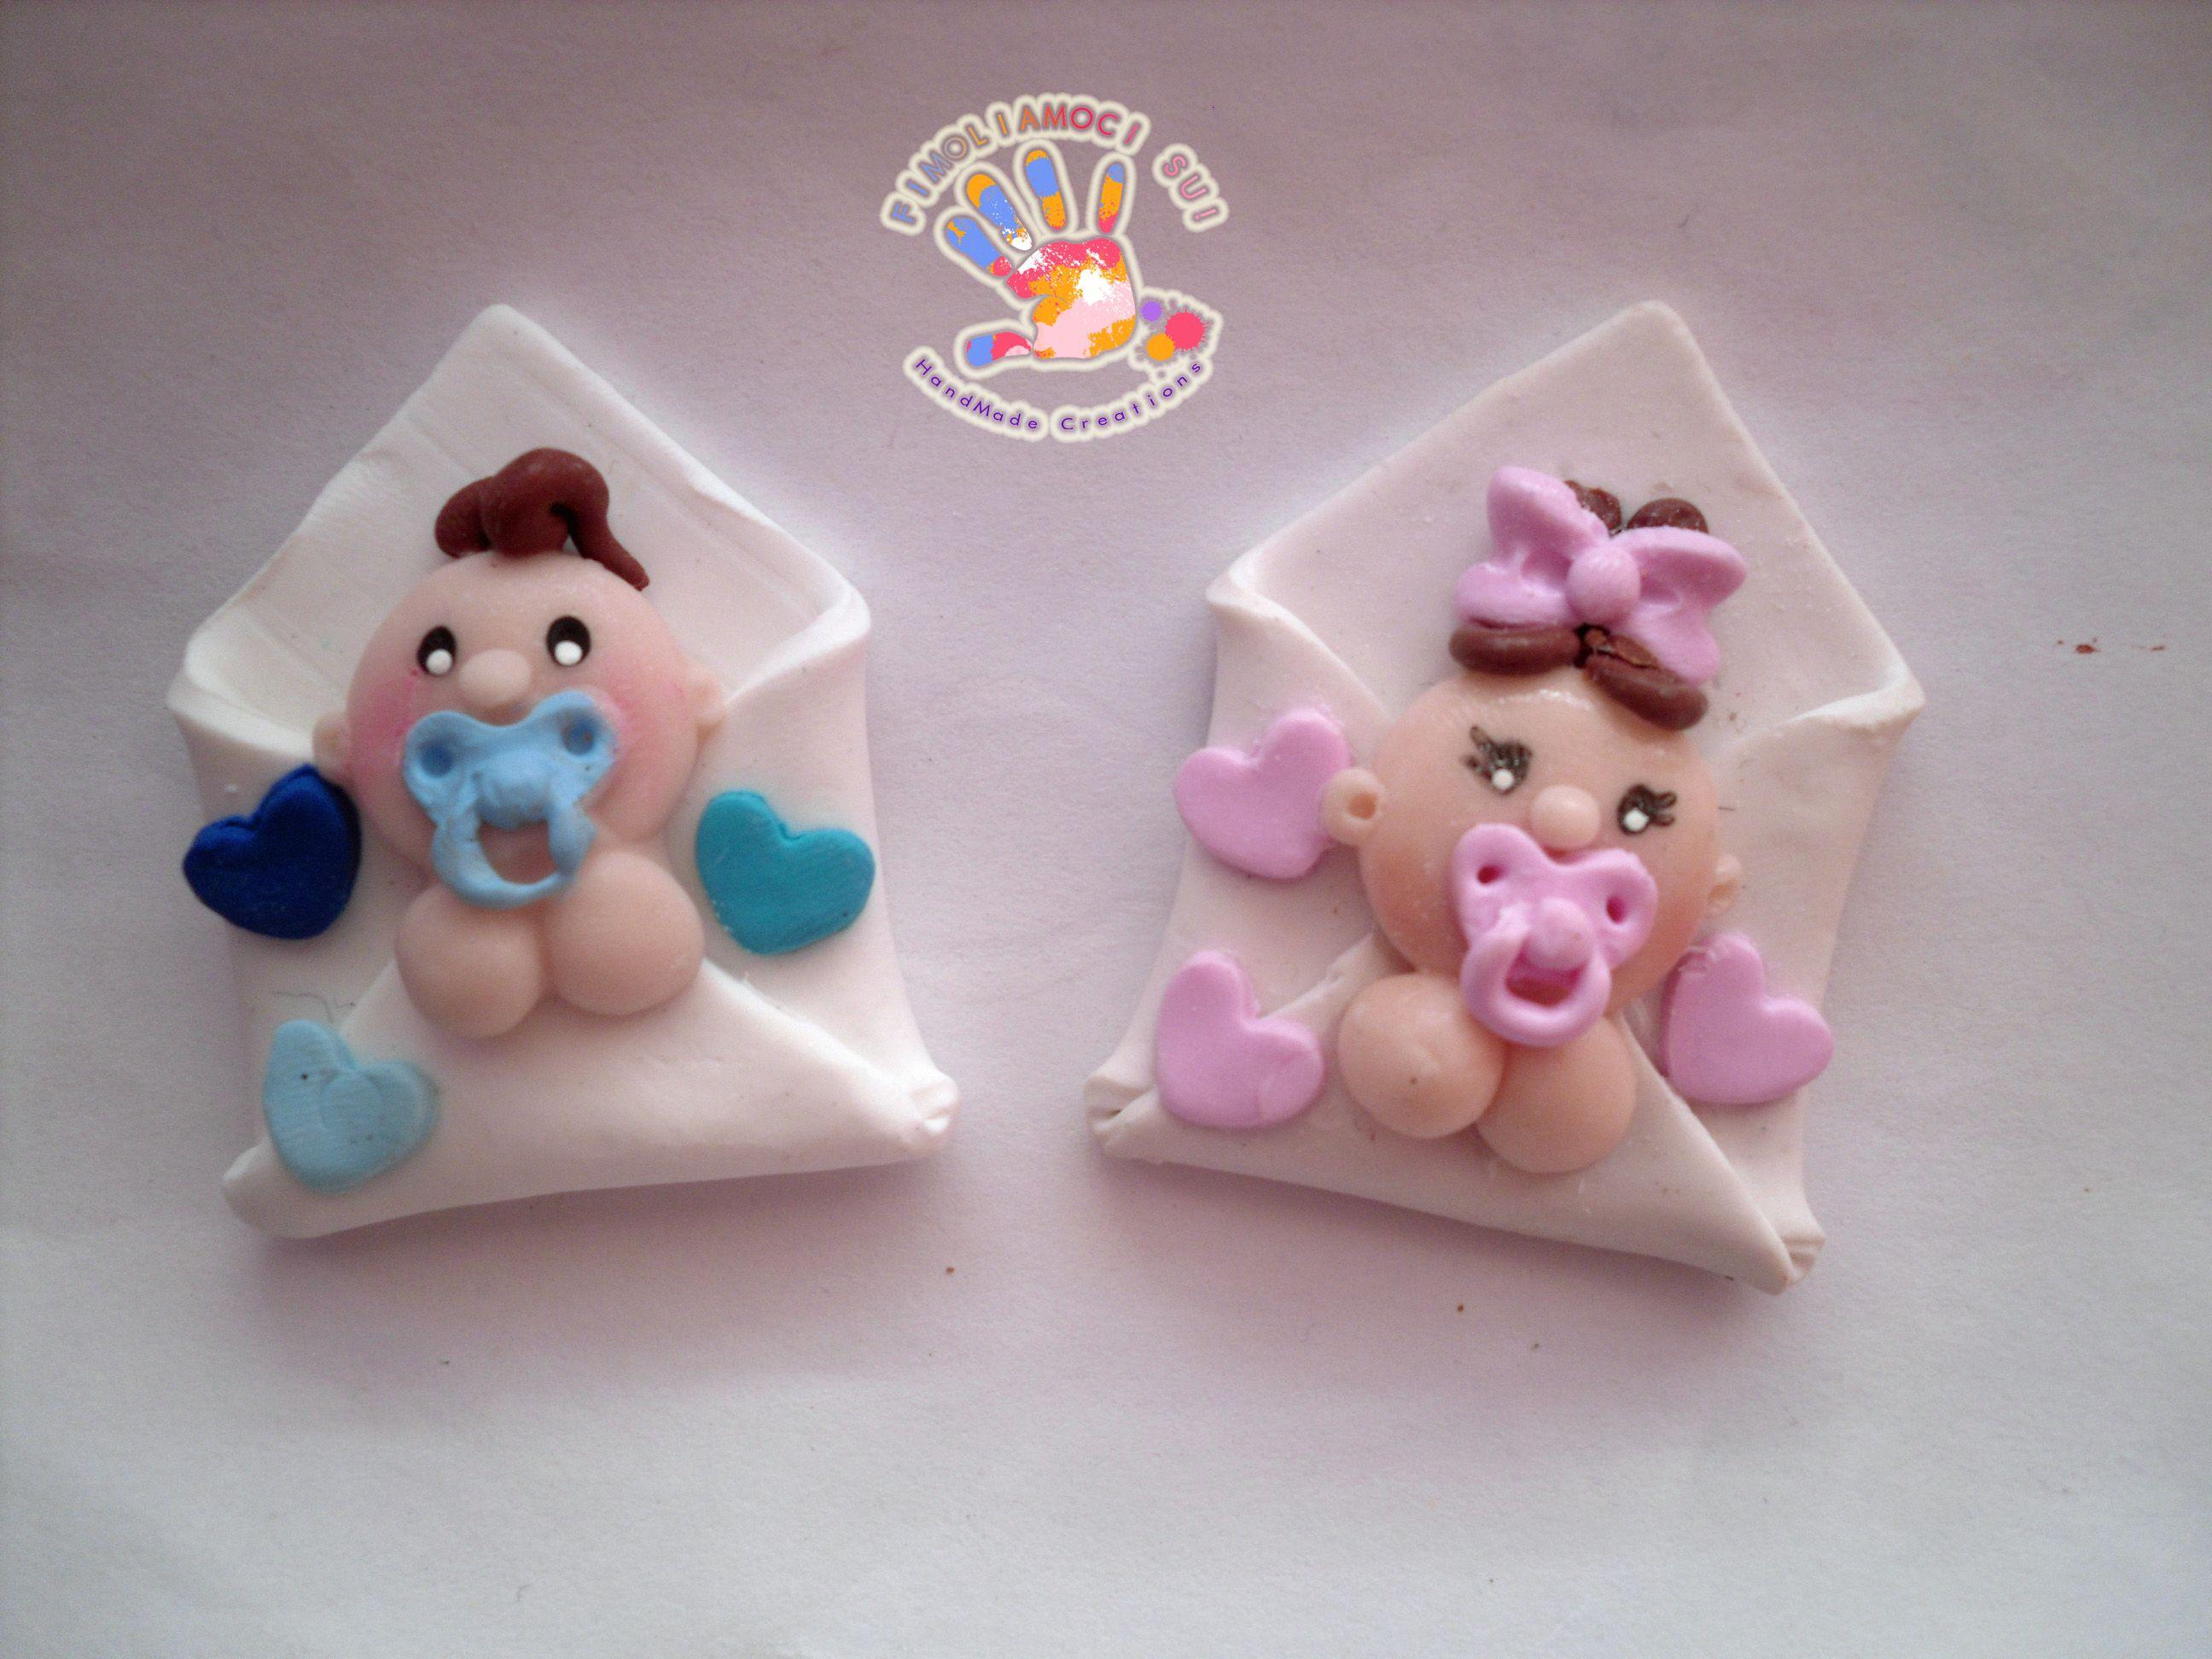 Fimo Bambini ~ Piccoli bimbi in busta in fimo ideas de porcelana fria